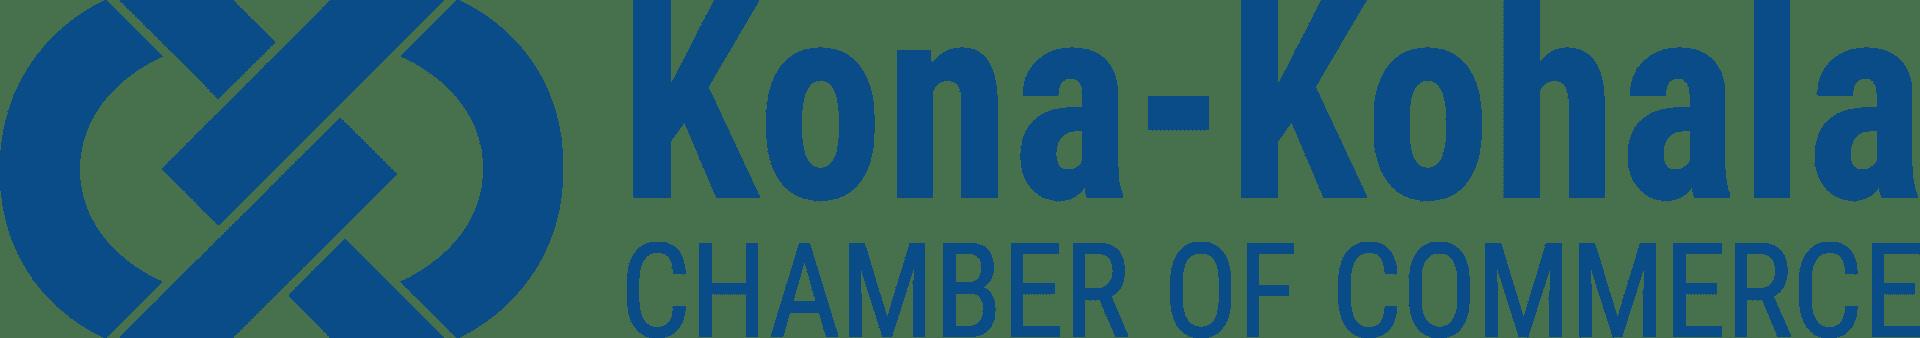 Kona-Kohala Chamber of Commerce Logo